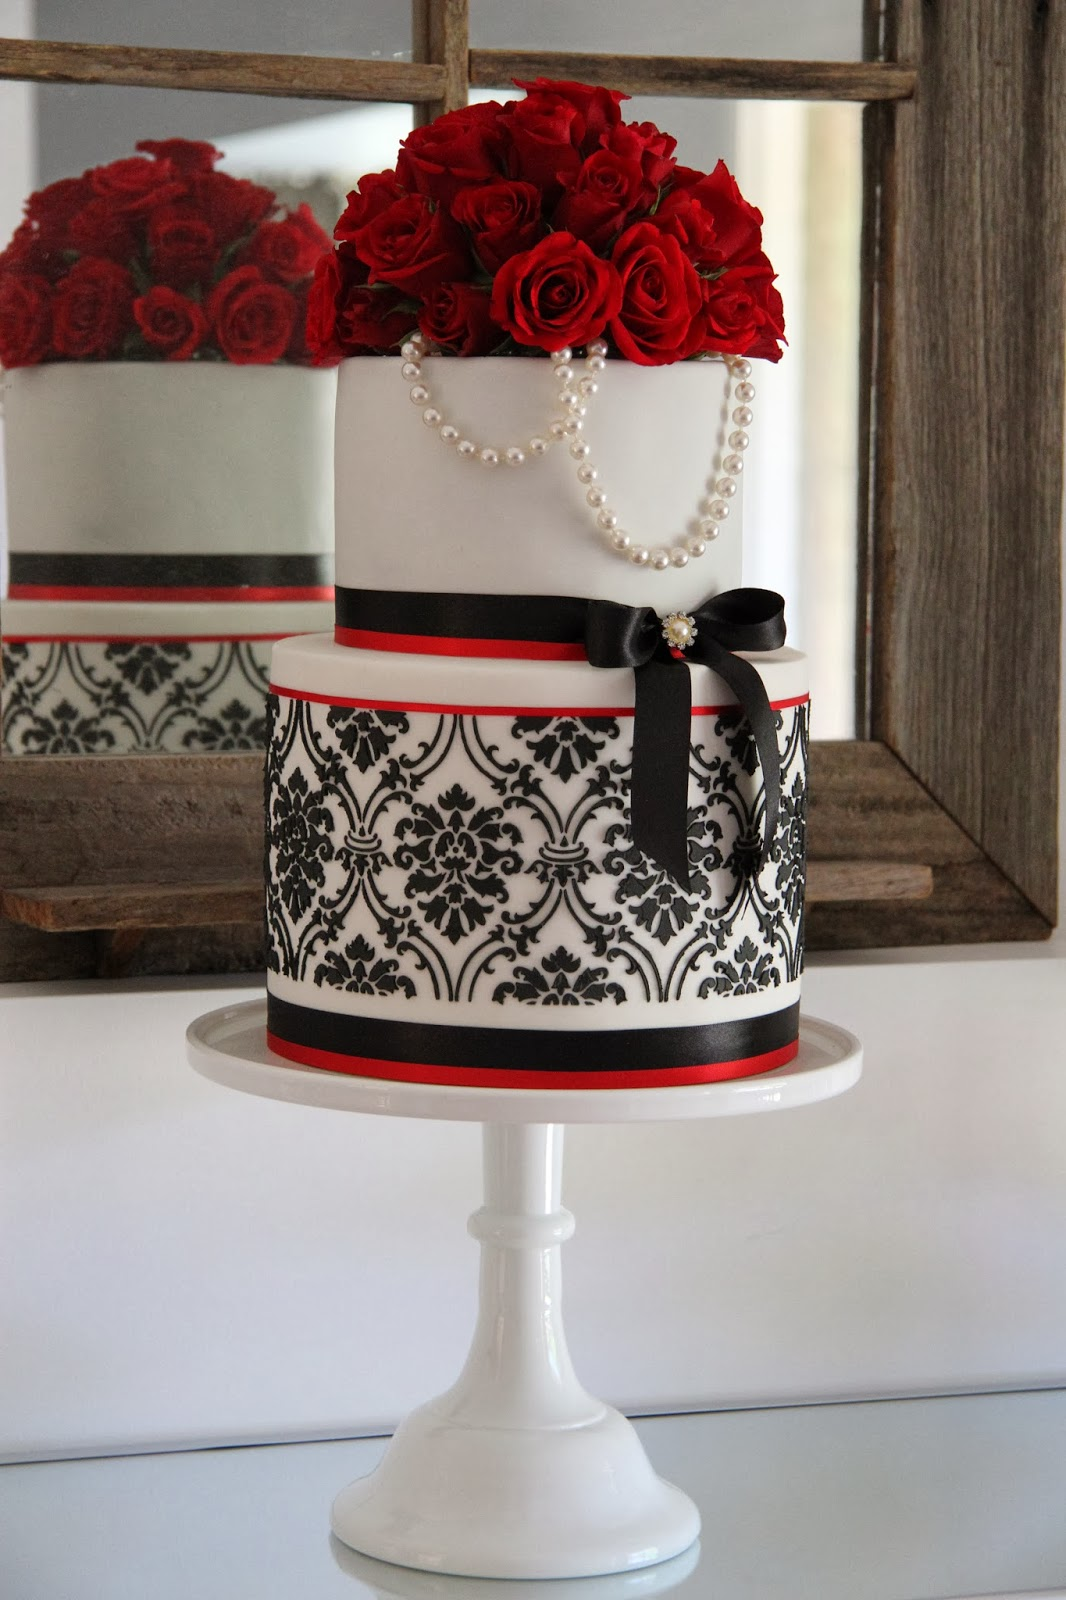 leonie u0026 39 s cakes and parties            yvonne u0026 39 s 40th birthday